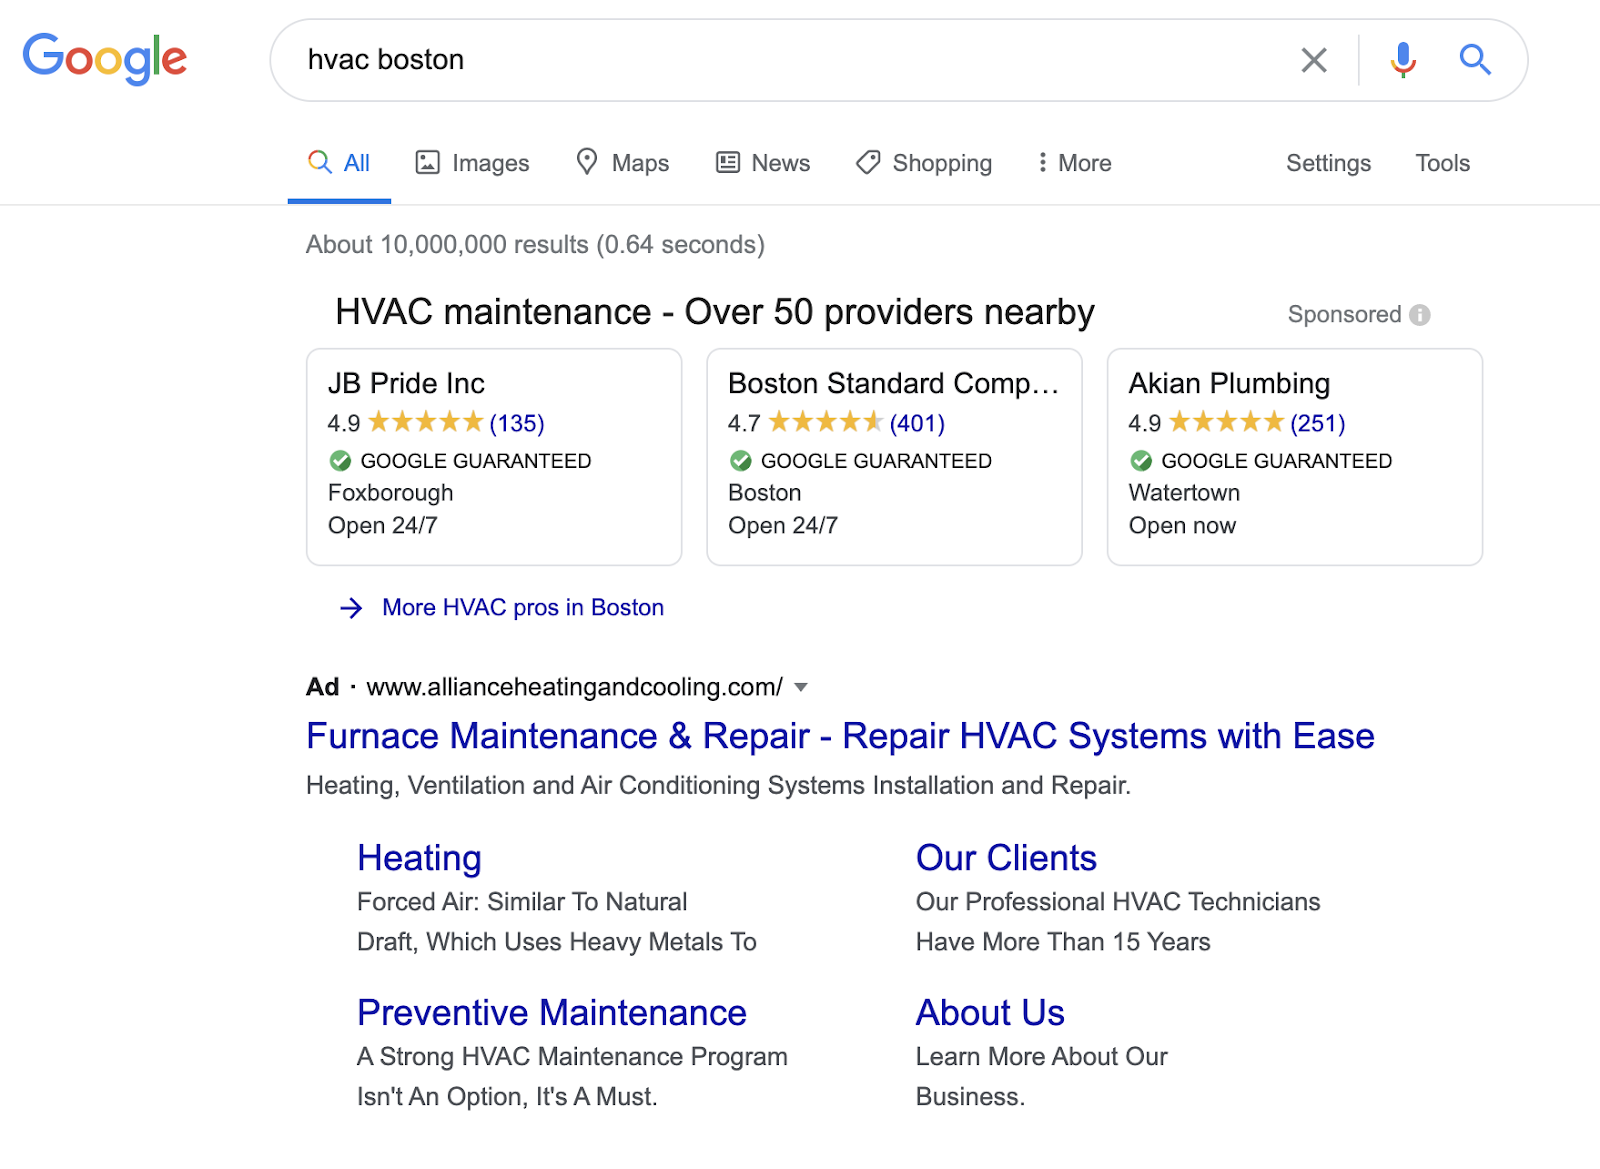 hvac boston google local services ads on serp